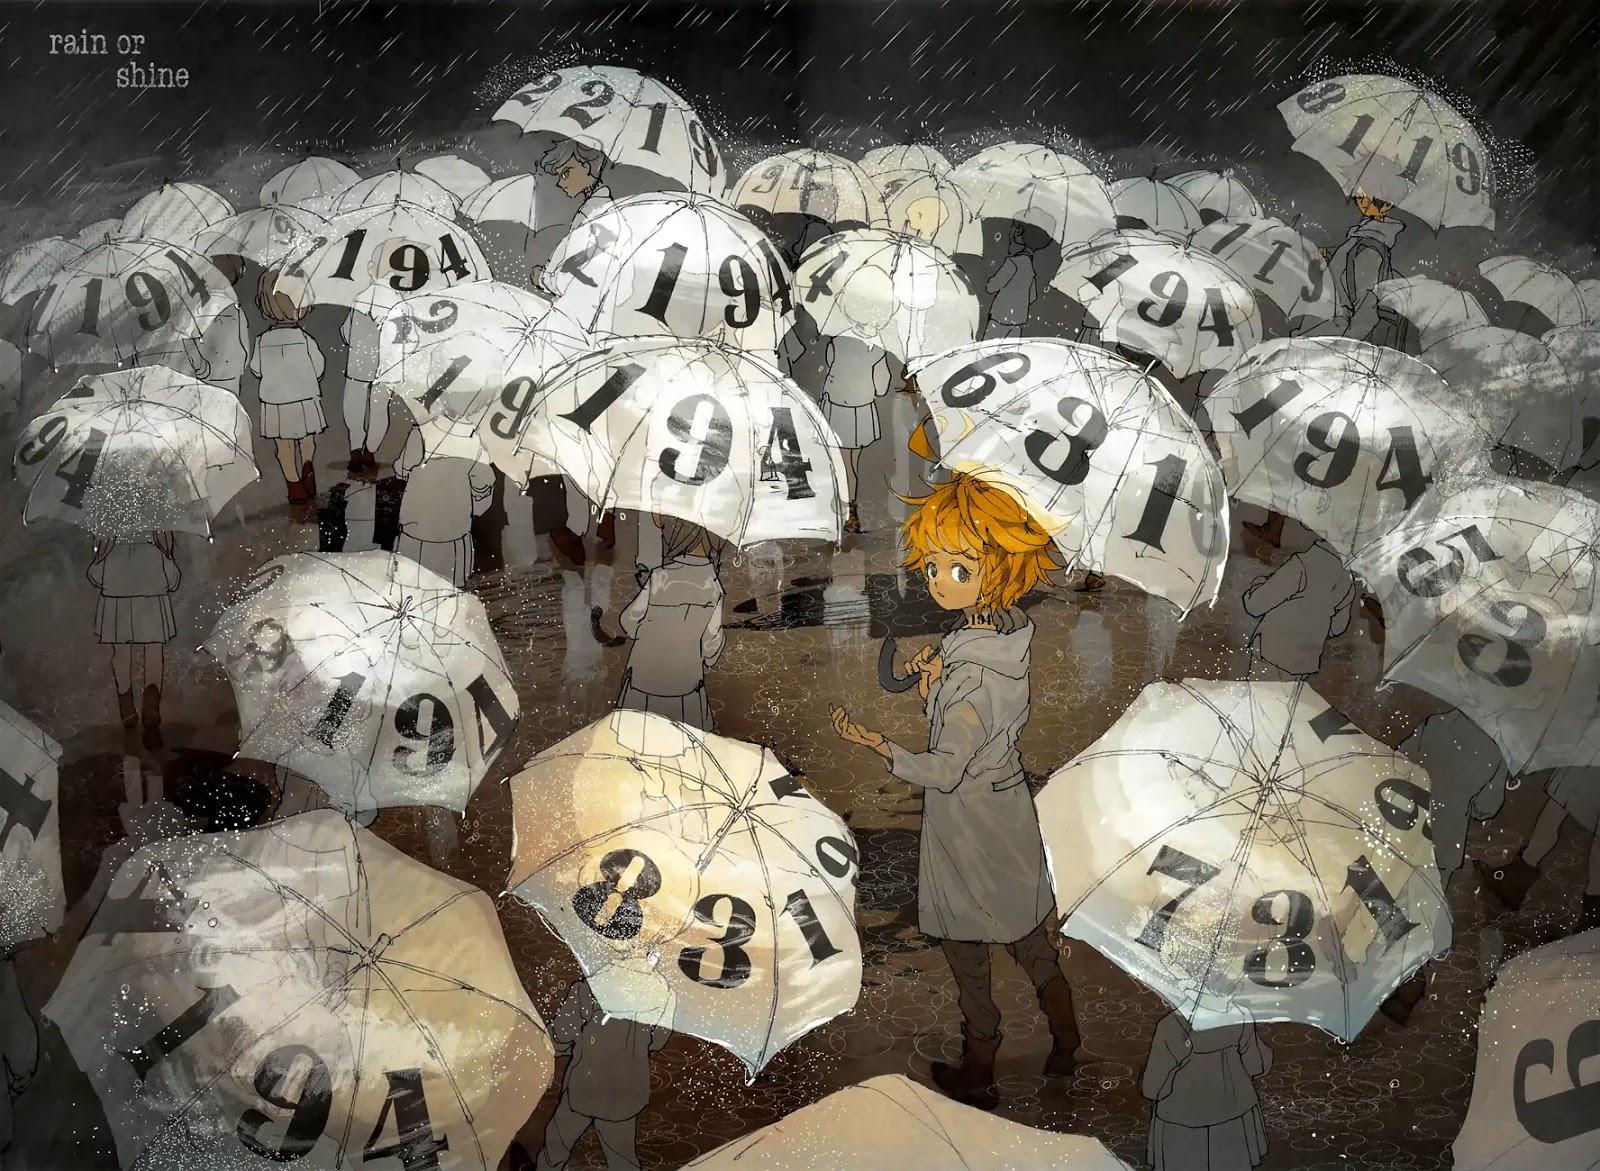 yakusoku no neverland,The Promised Neverland, Yakusoku no Neverland, Norman, Emma,read The promised neverland, Ray, Isabella, the promised neverland season 1, the promised neverland characters,manga online